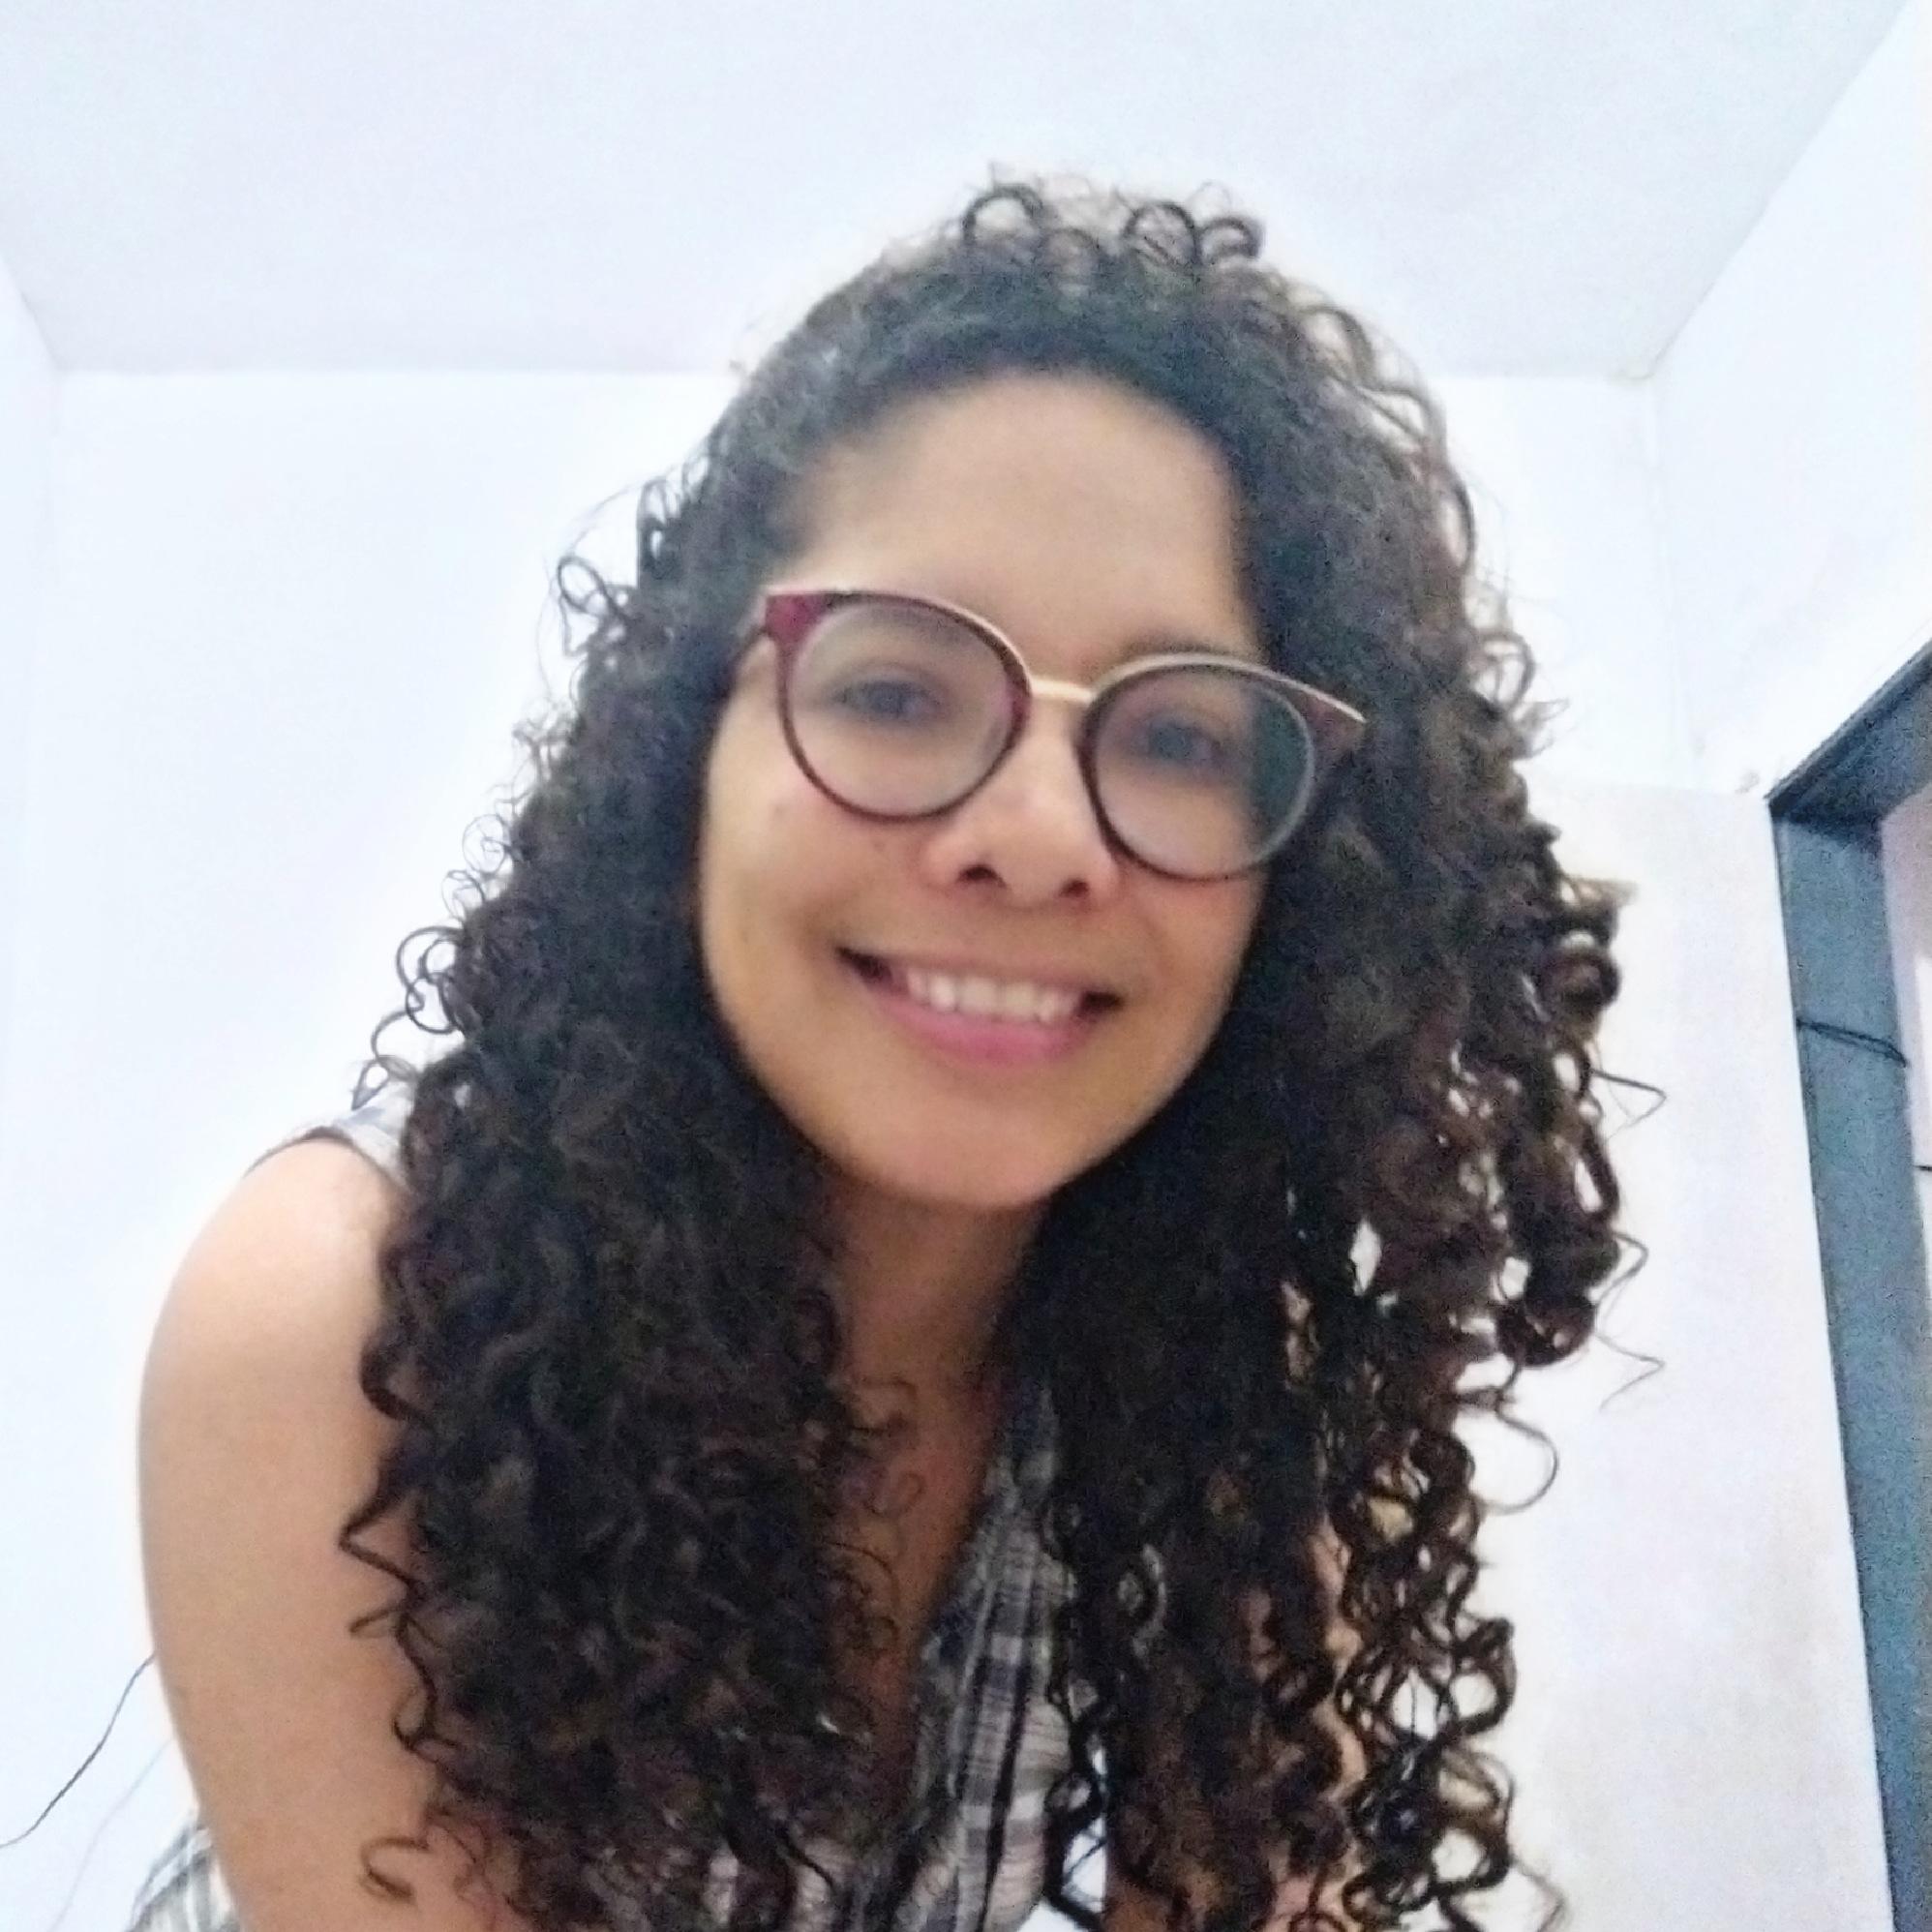 Lilian Carvalho